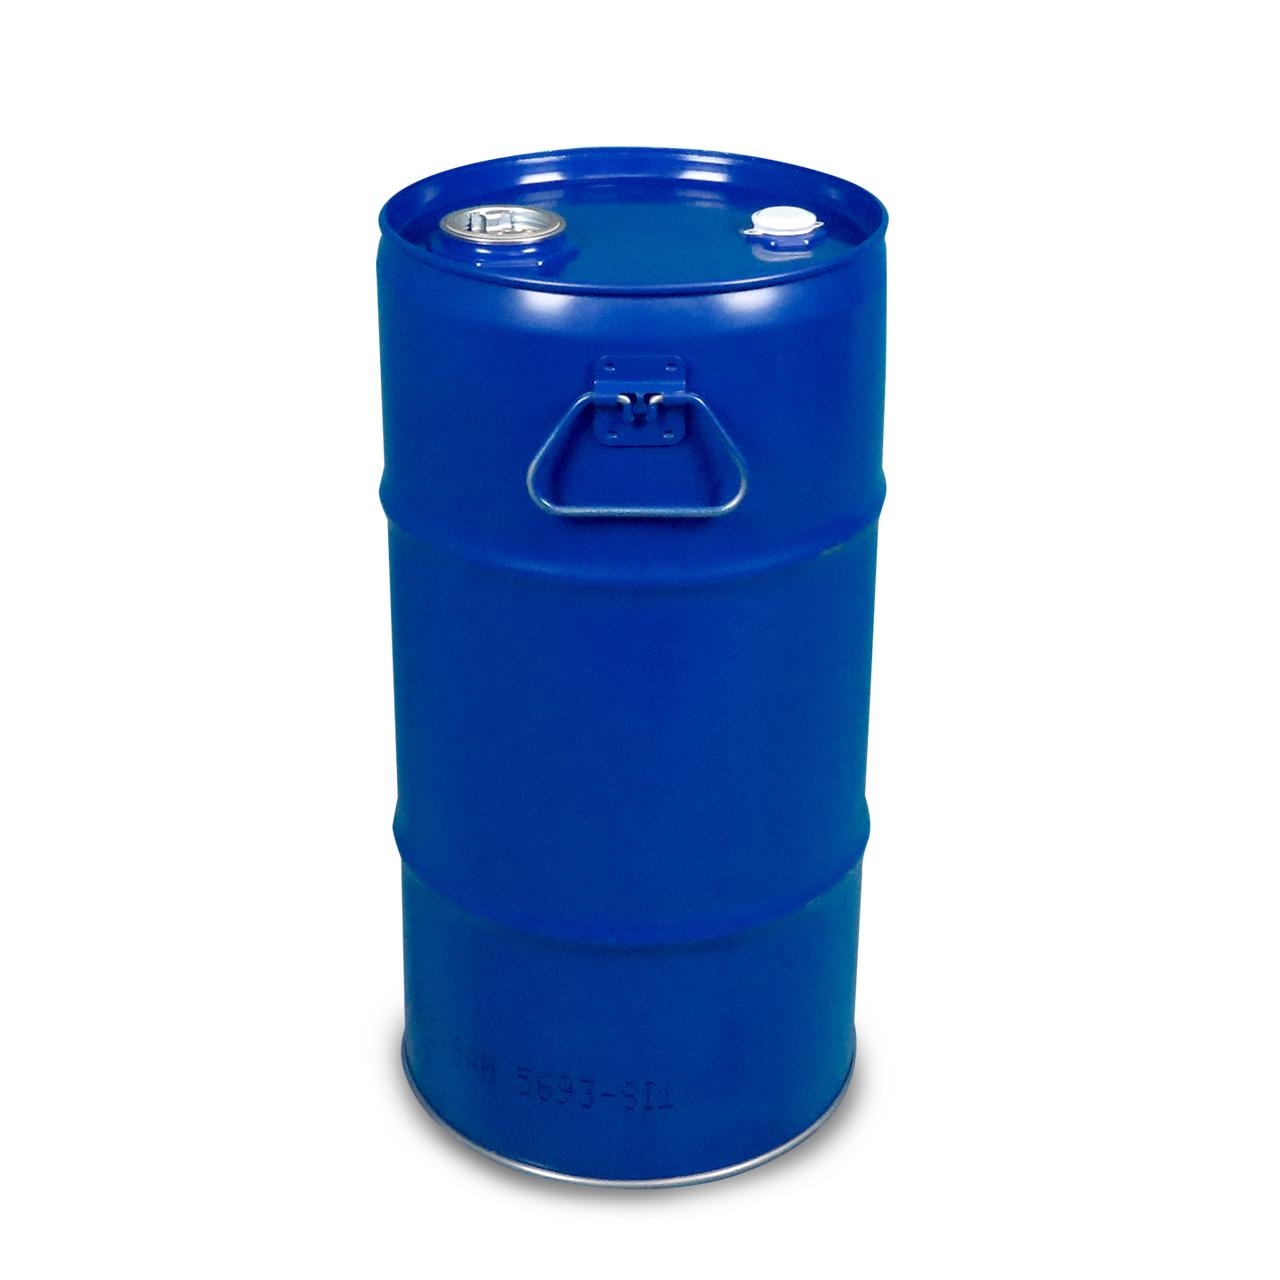 30 L Stahlspundbehälter, lackiert, blau 5010, FDA, UN Zulassung